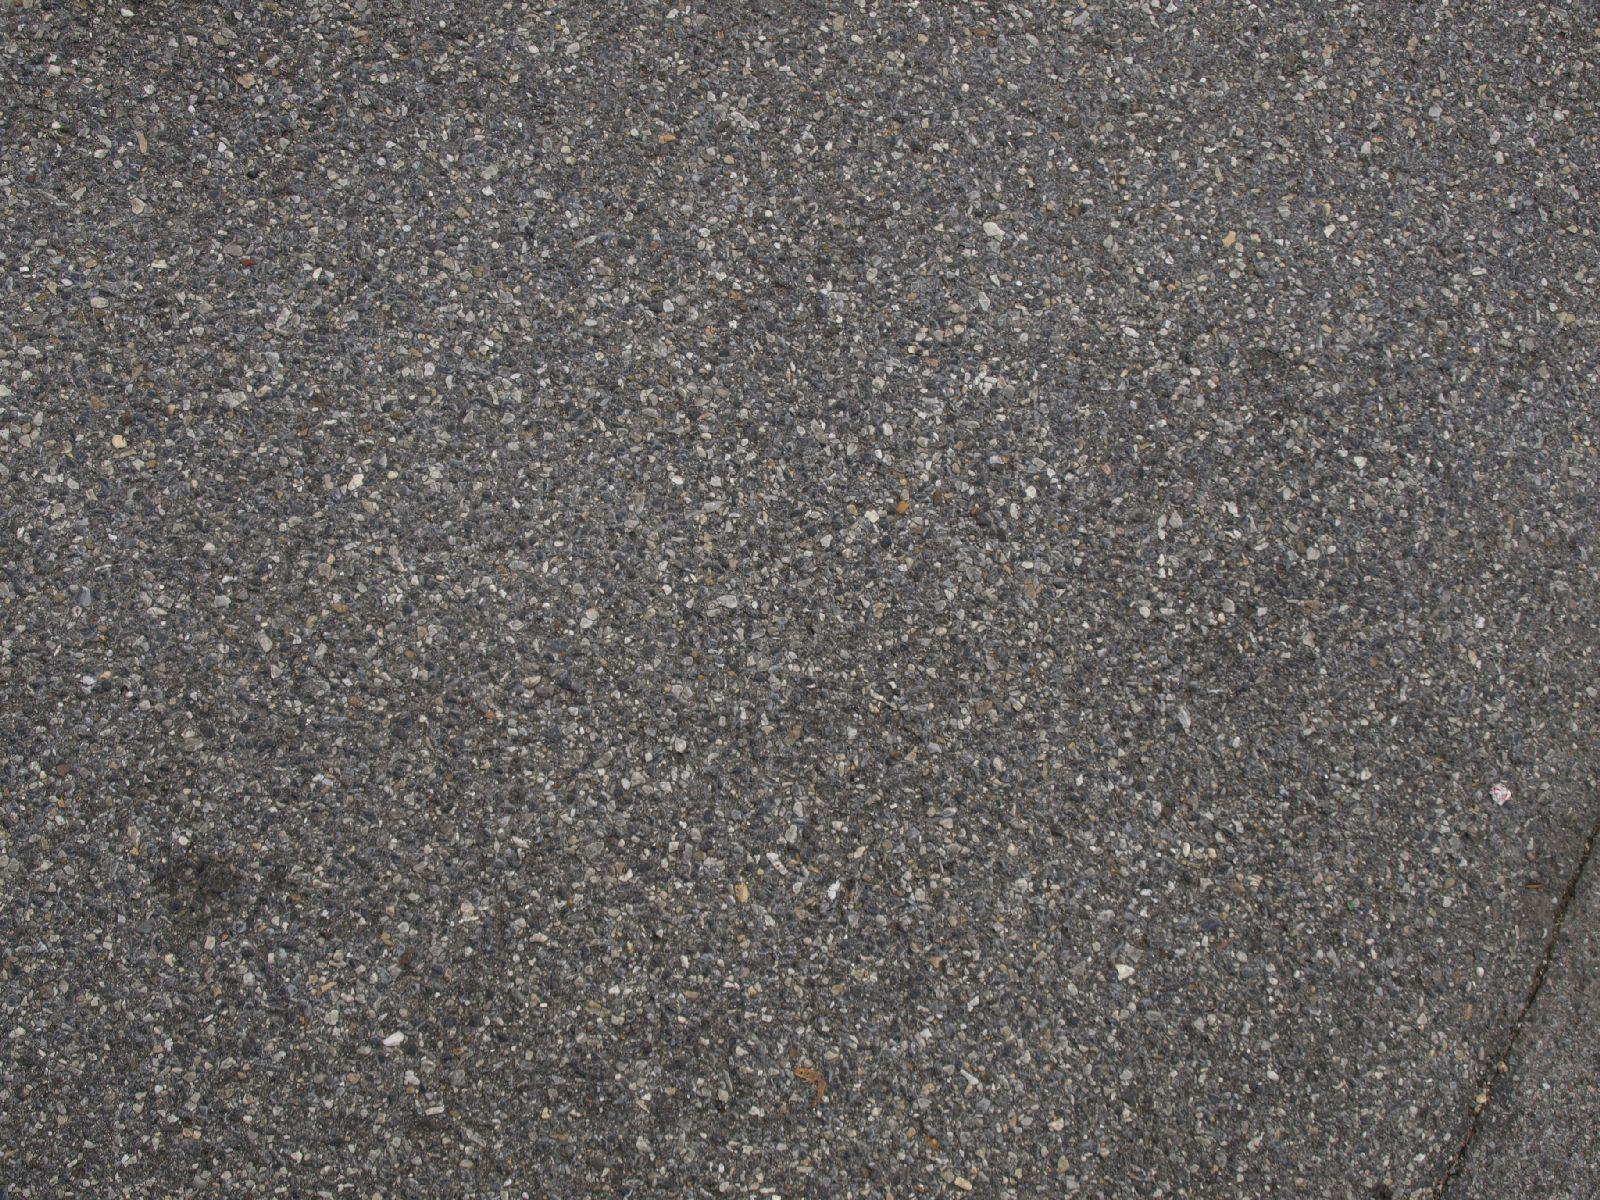 Boden-Gehweg-Strasse-Buergersteig-Textur_A_PA045691